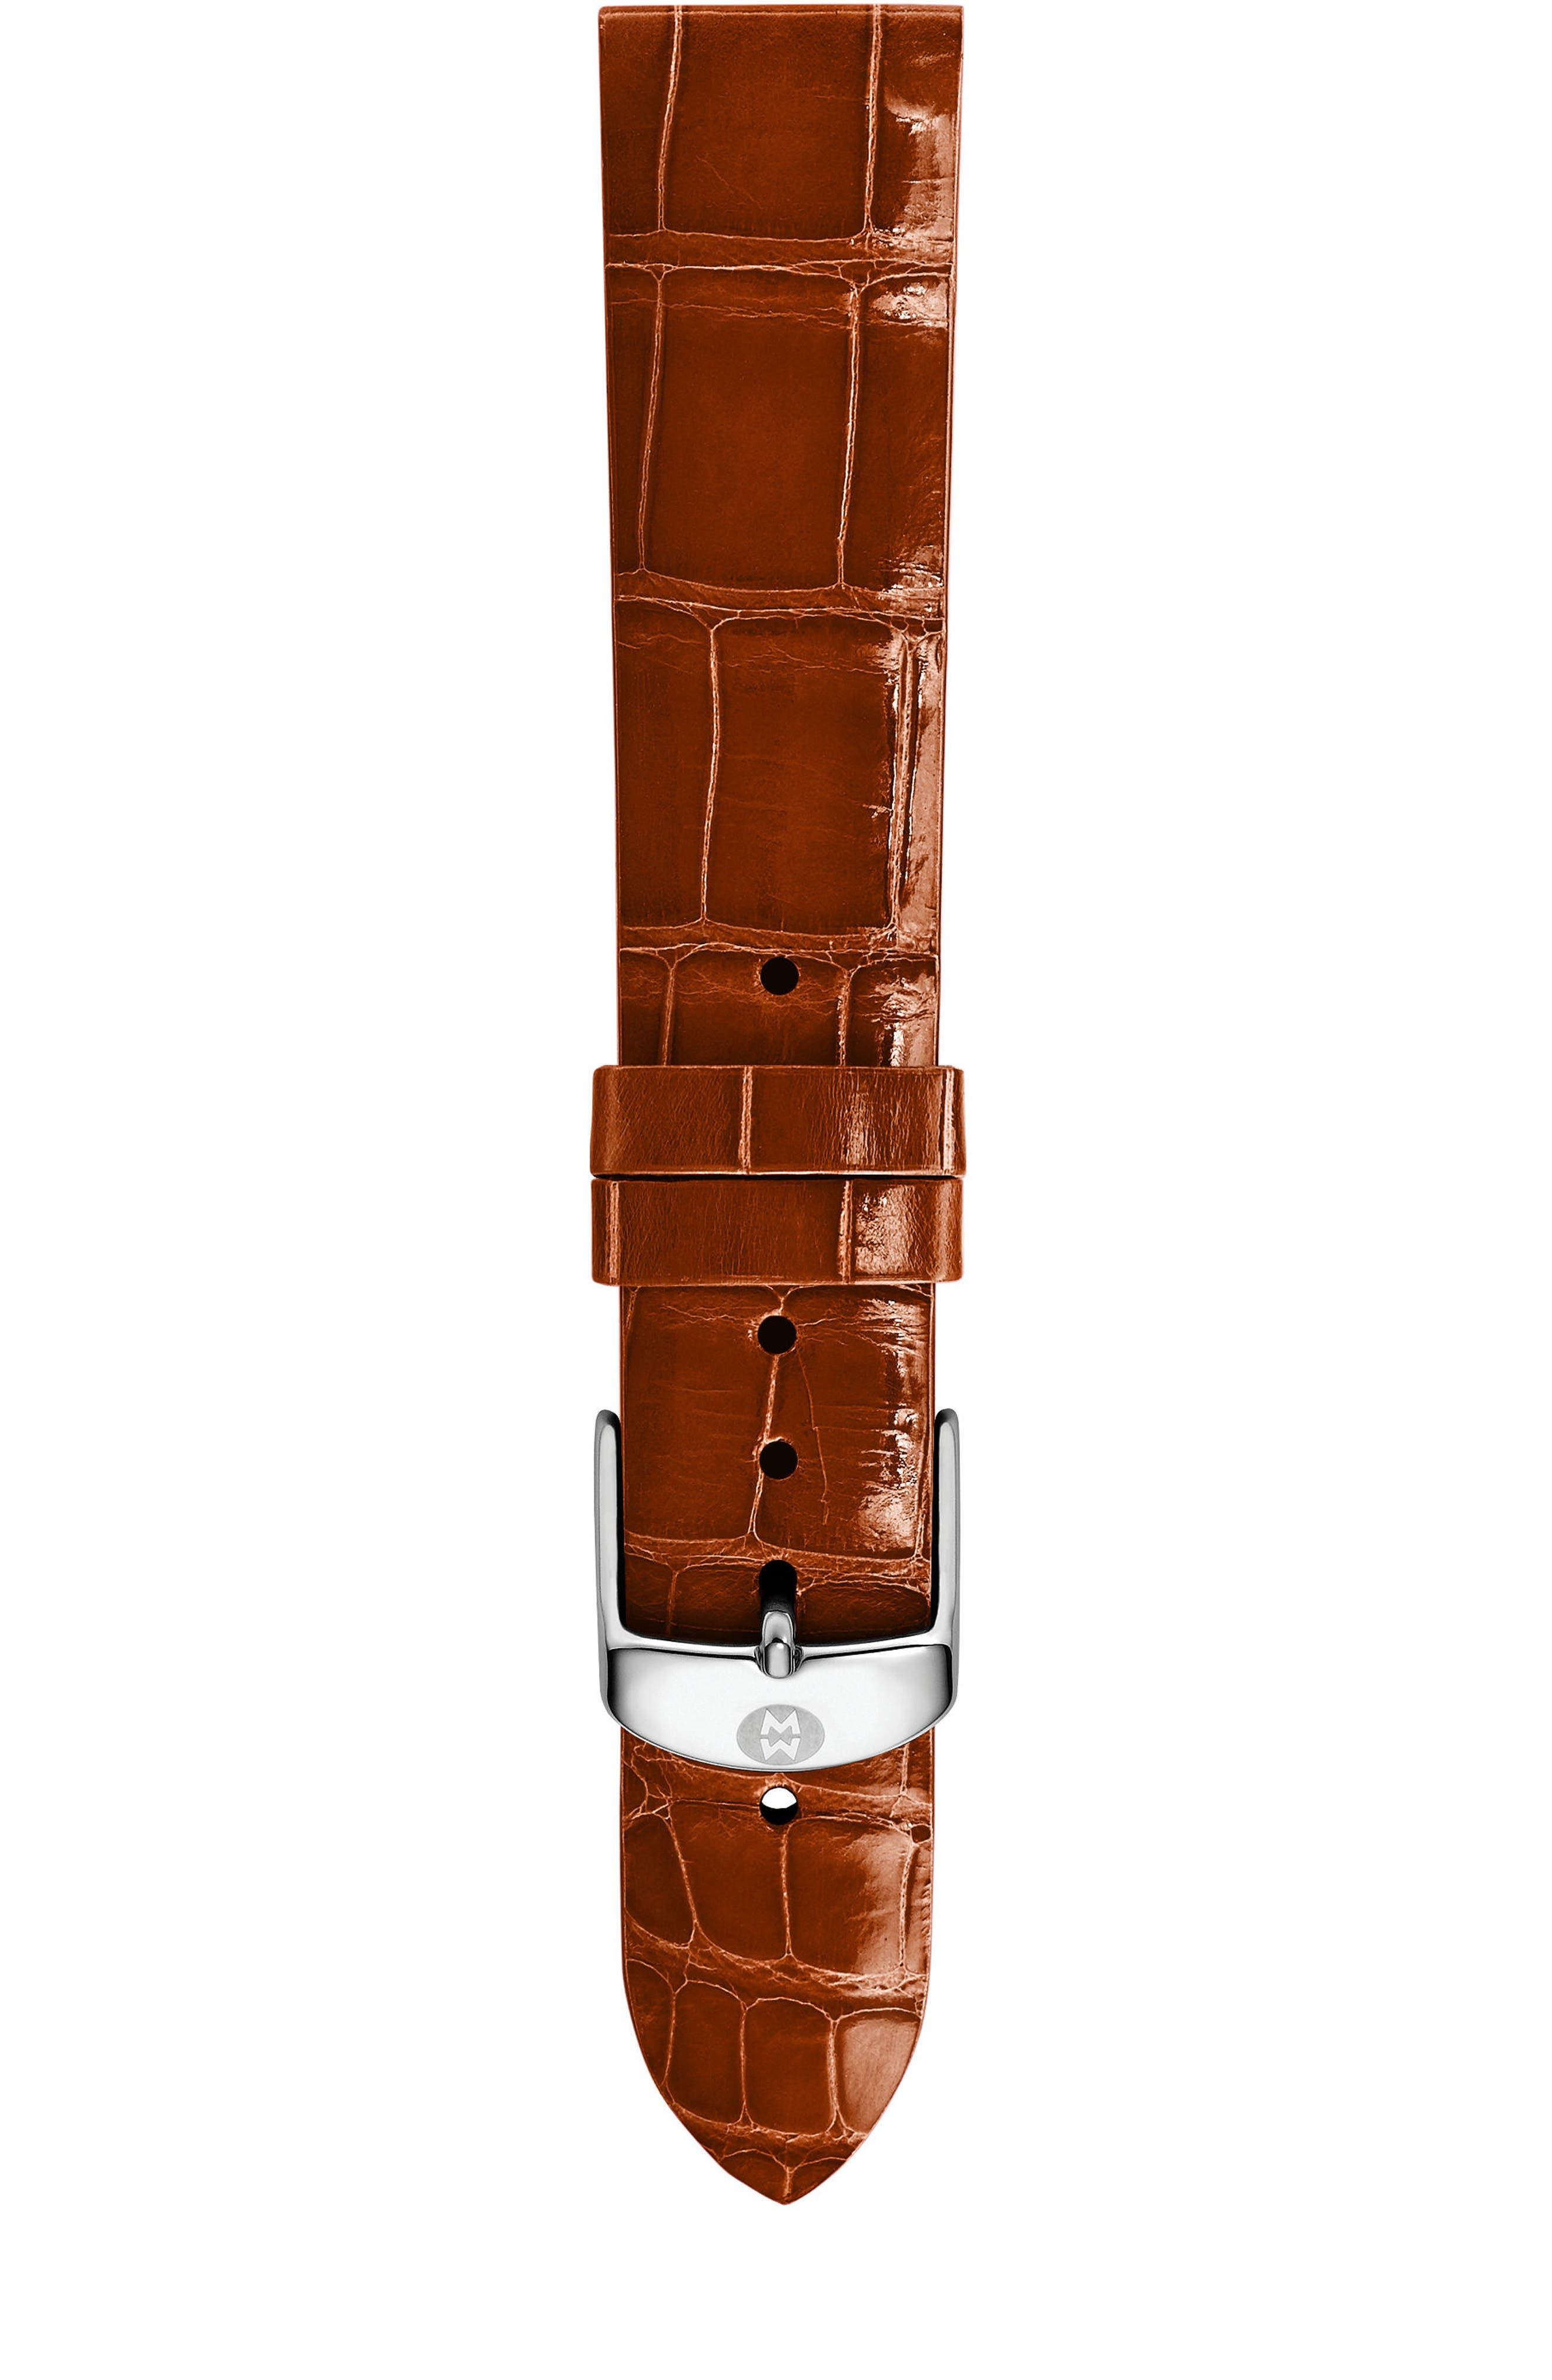 16mm Alligator Watch Strap,                         Main,                         color, Coffee